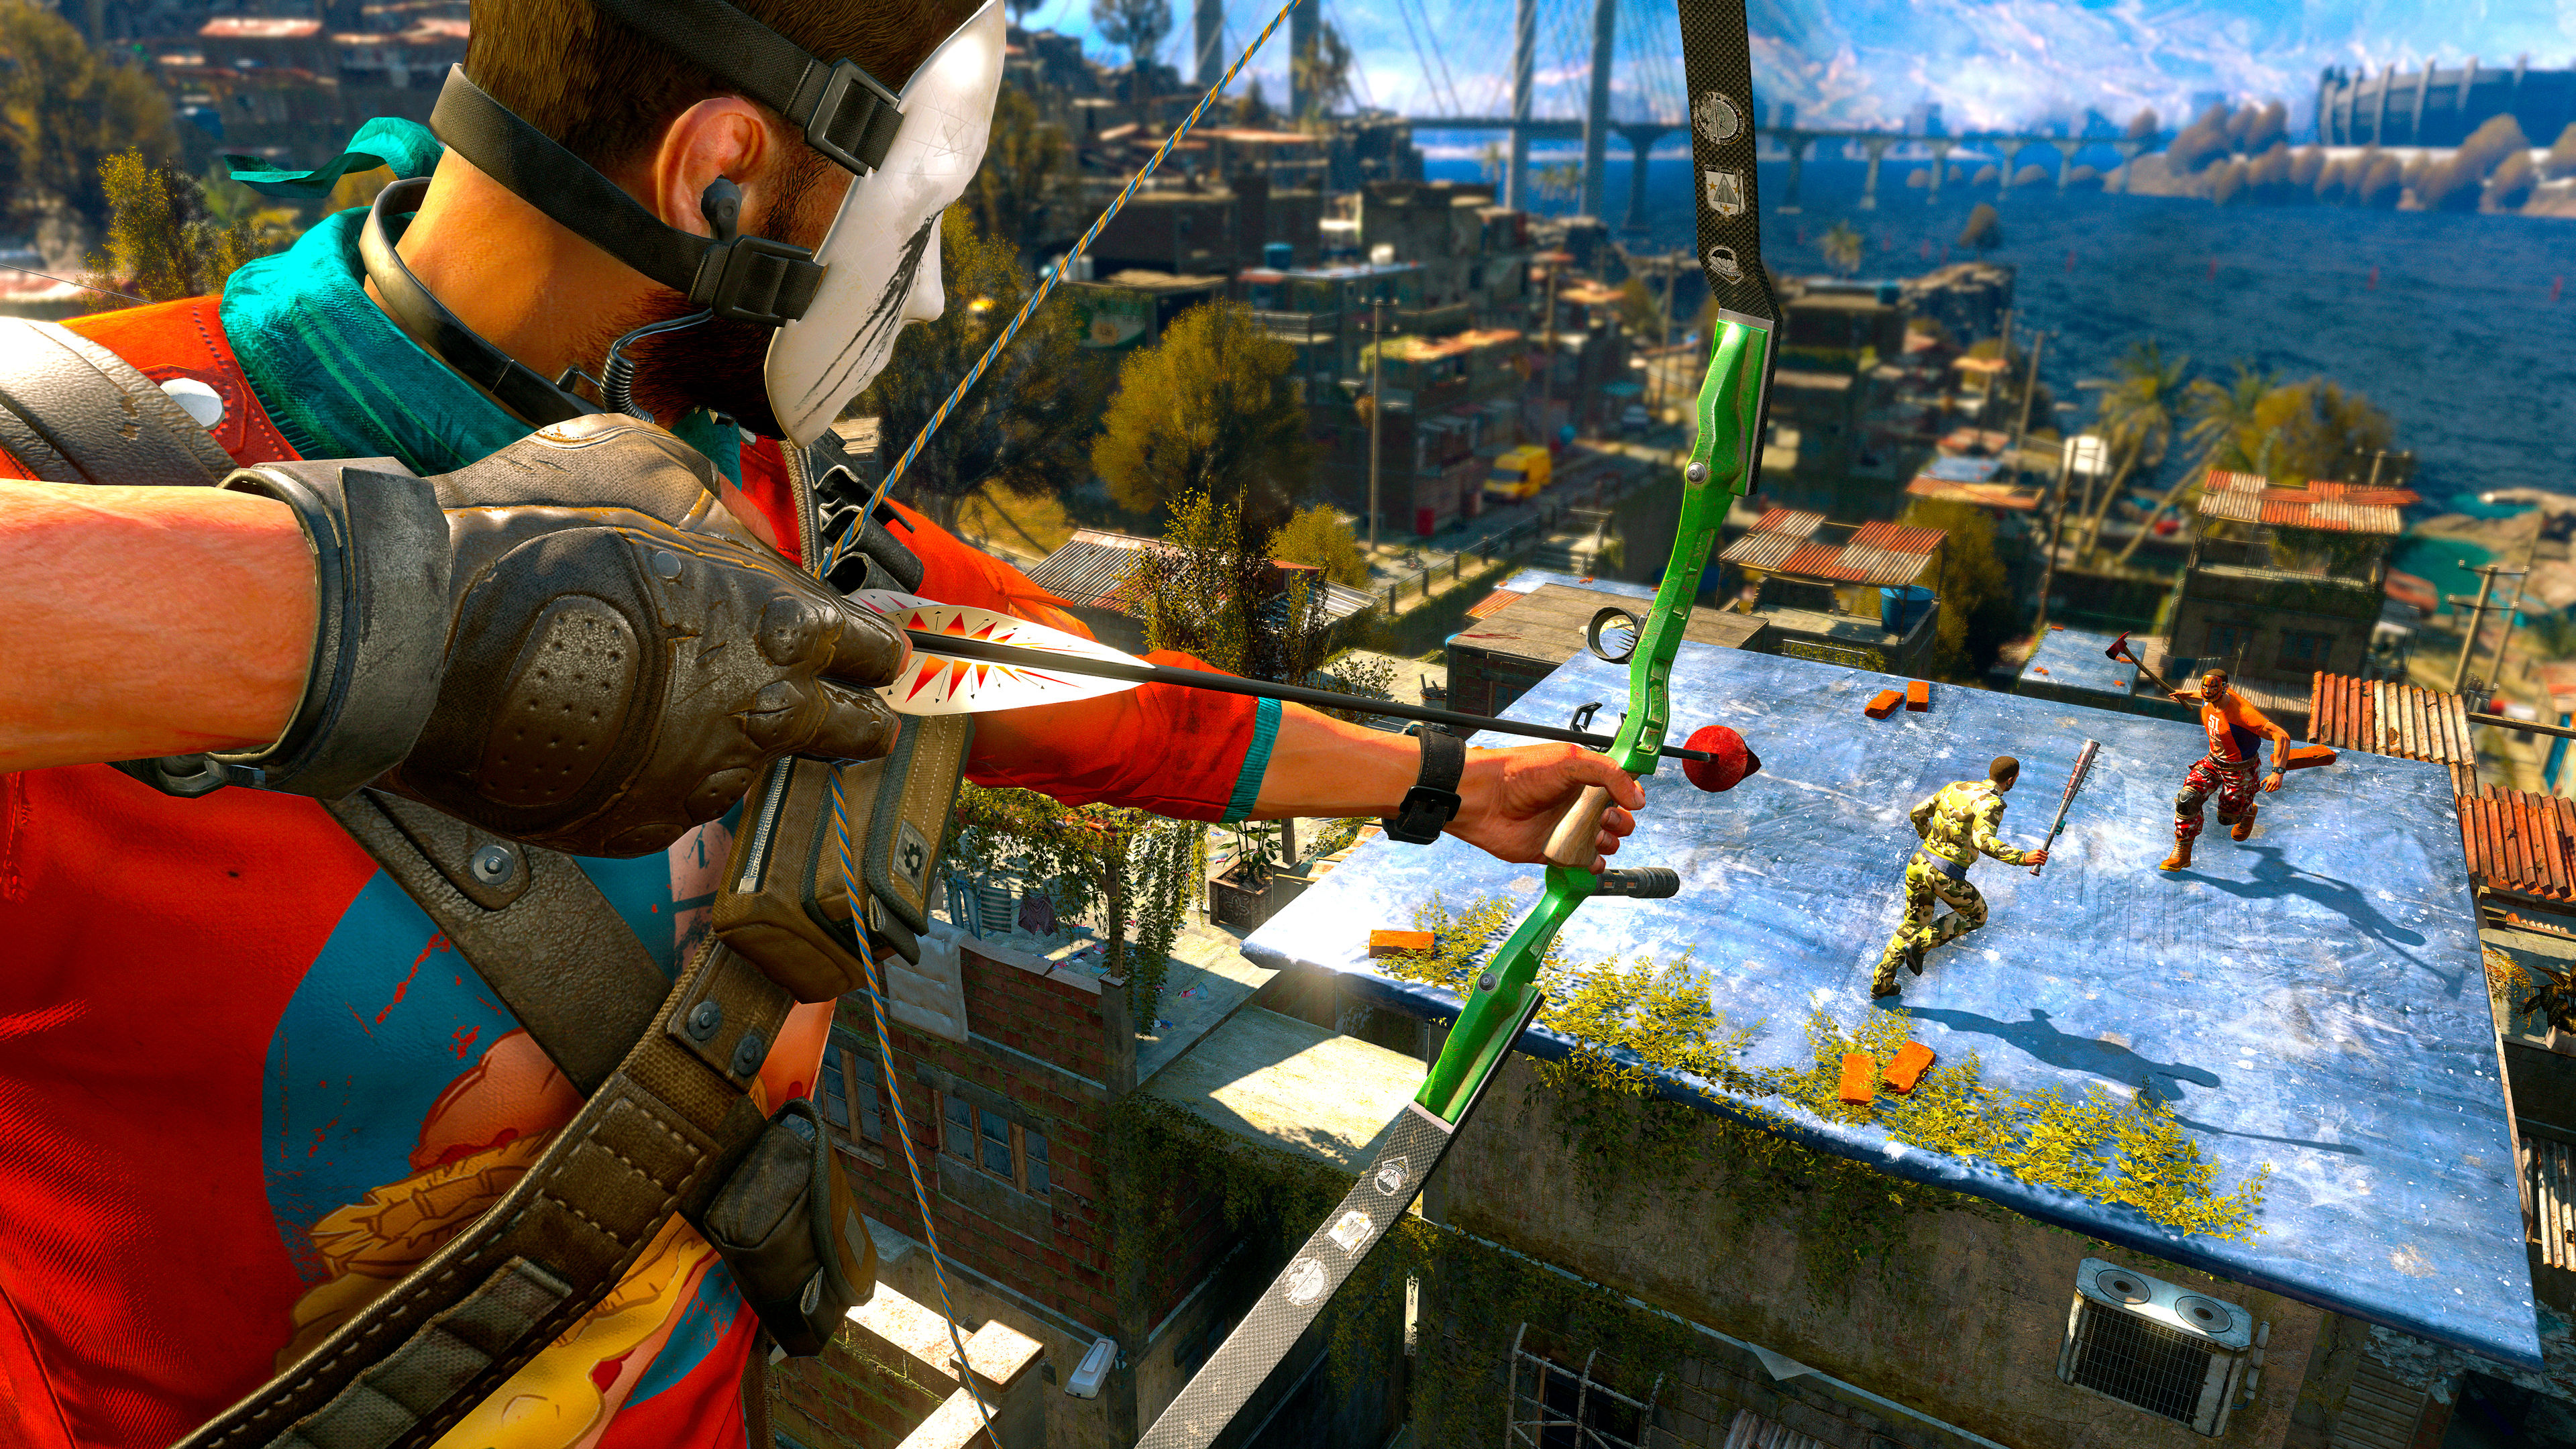 44449343761 5b284b189e o - Dying Light 2 & Dying Light Bad Blood: Mehr Zombie-Spaß im Multiplayer